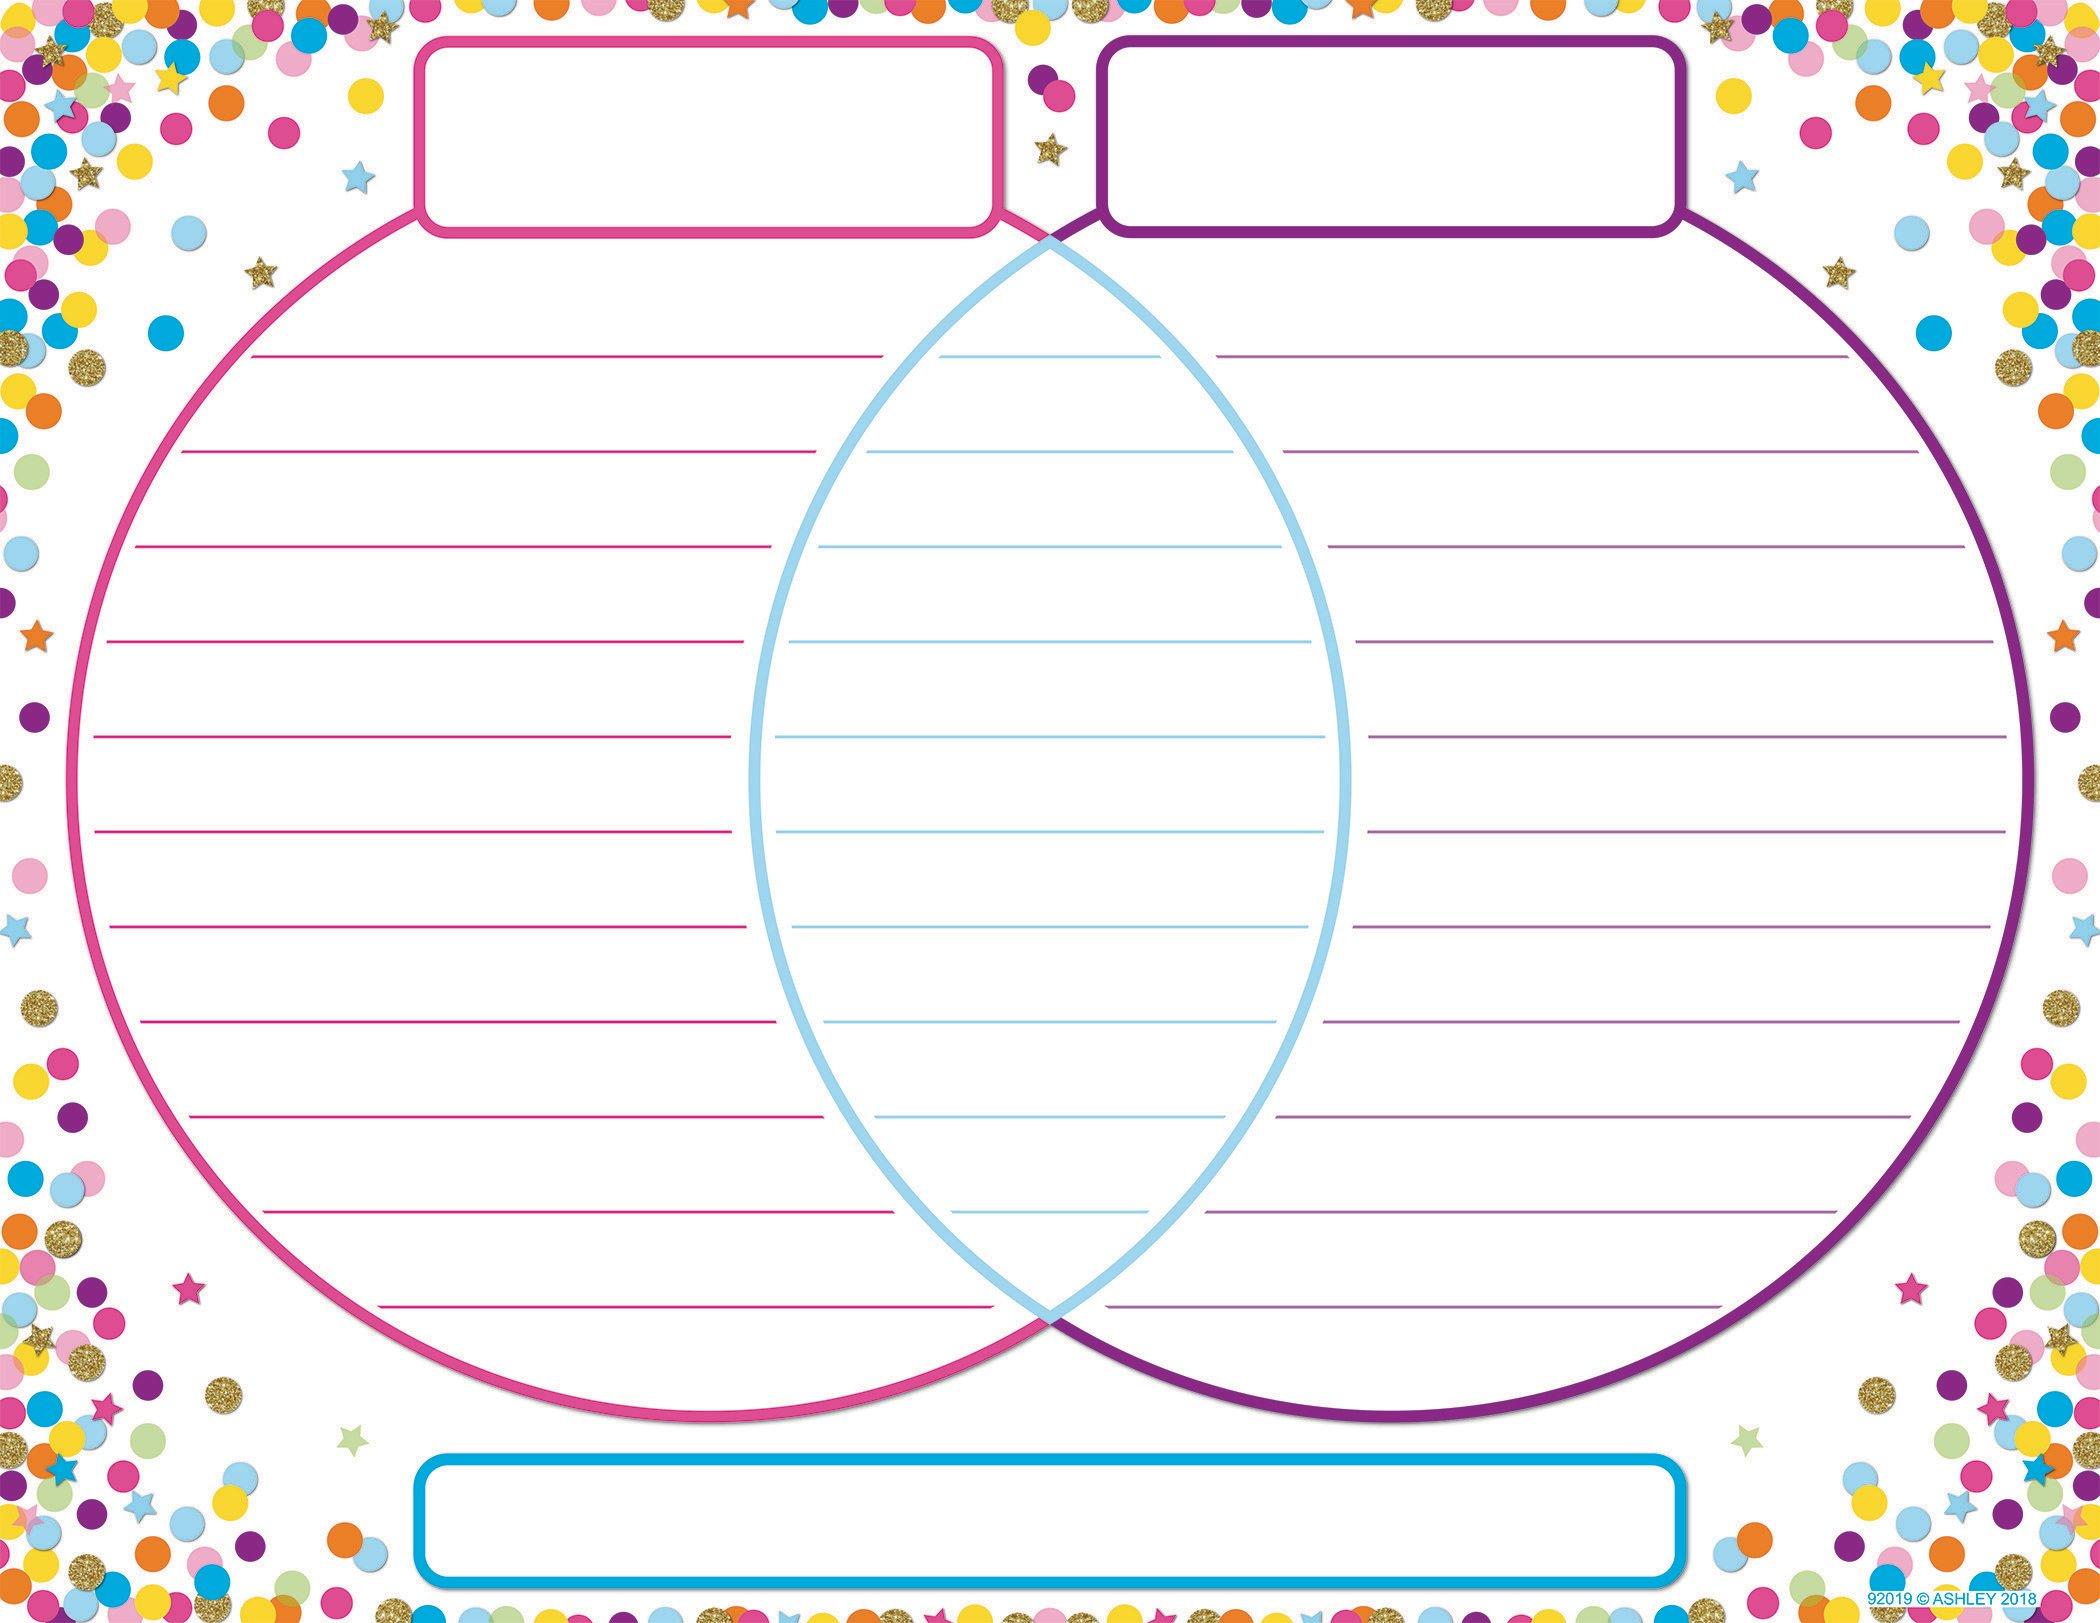 17x22 Confetti Venn Diagram Poly Chart Bell 2 Bell